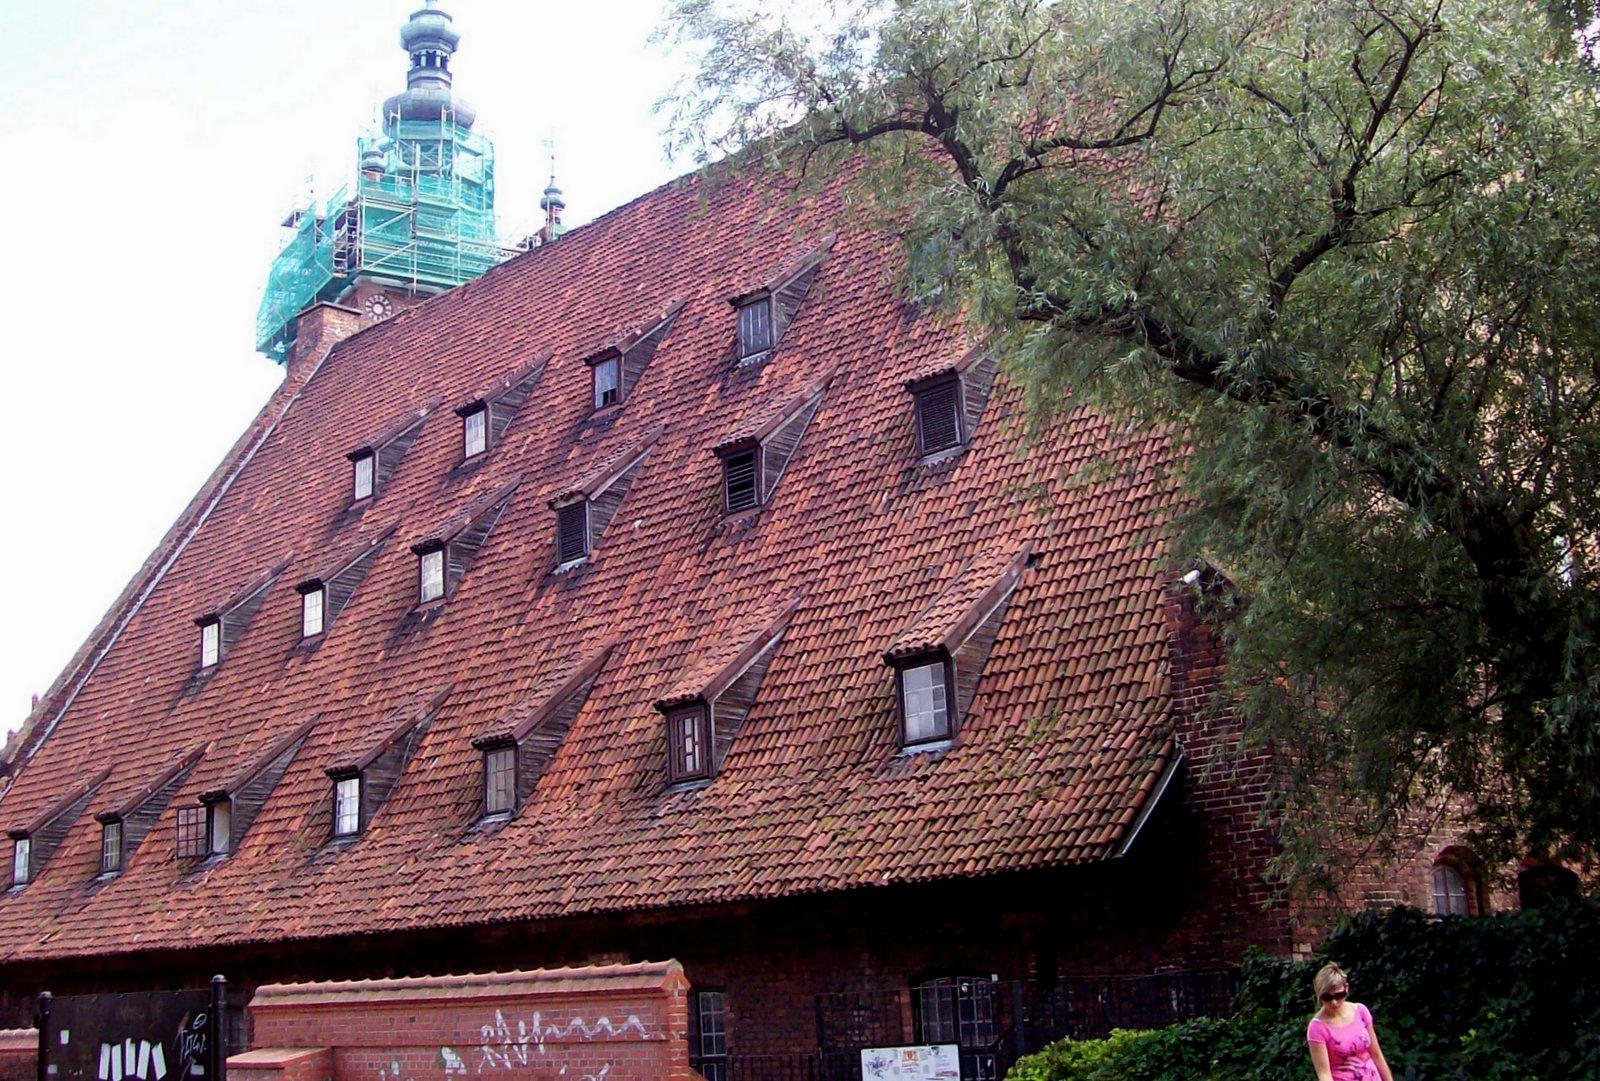 Große Mühle am Radaunekanal